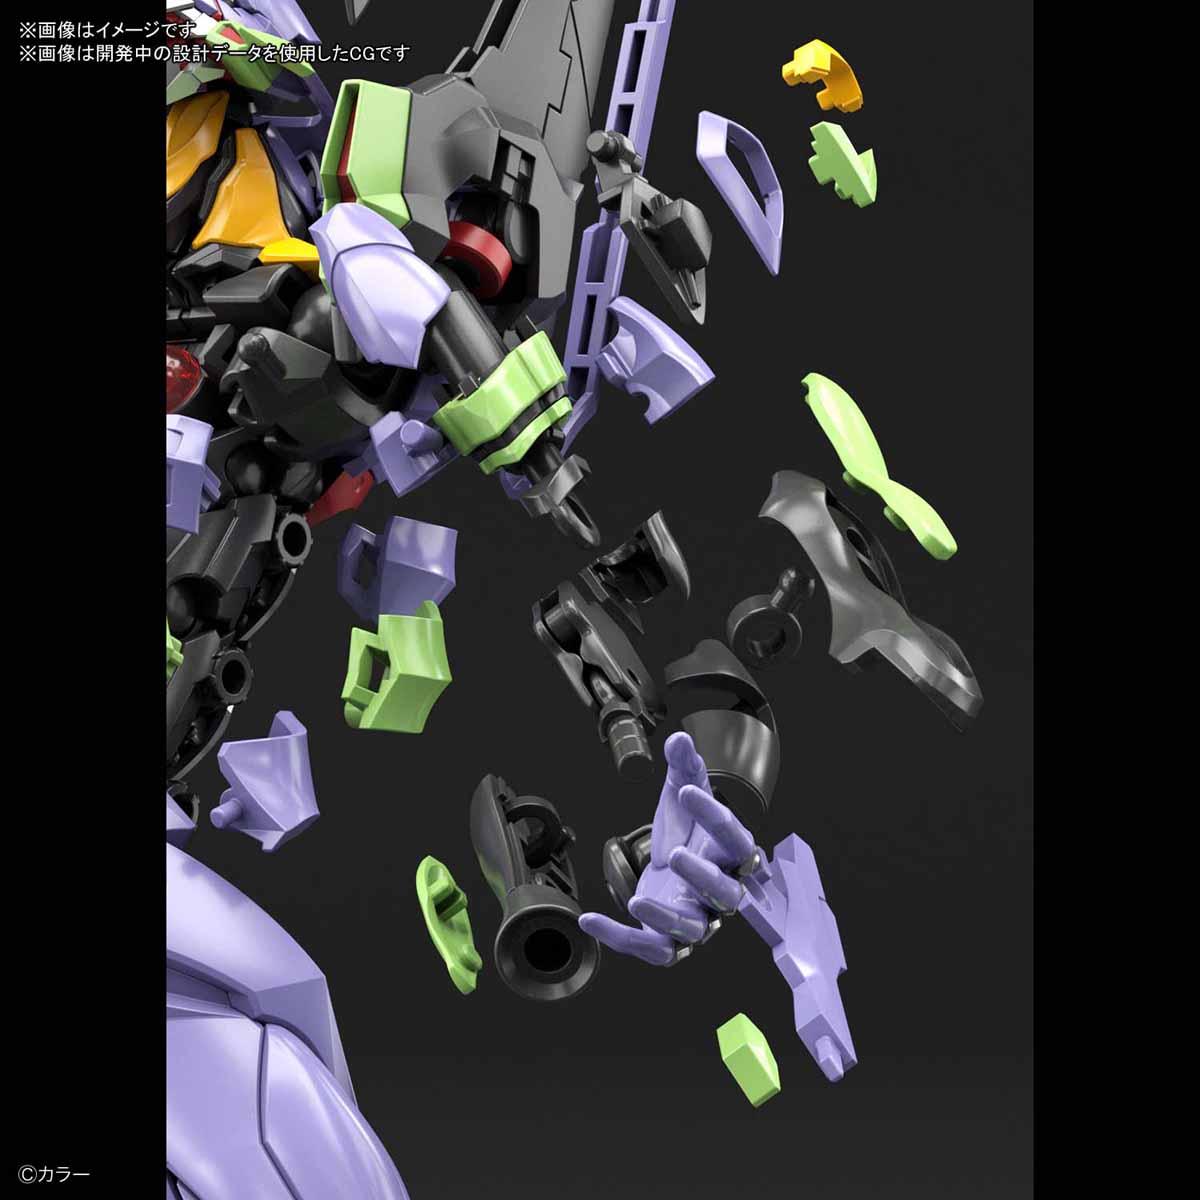 RG『汎用ヒト型決戦兵器 人造人間エヴァンゲリオン初号機』プラモデル-009